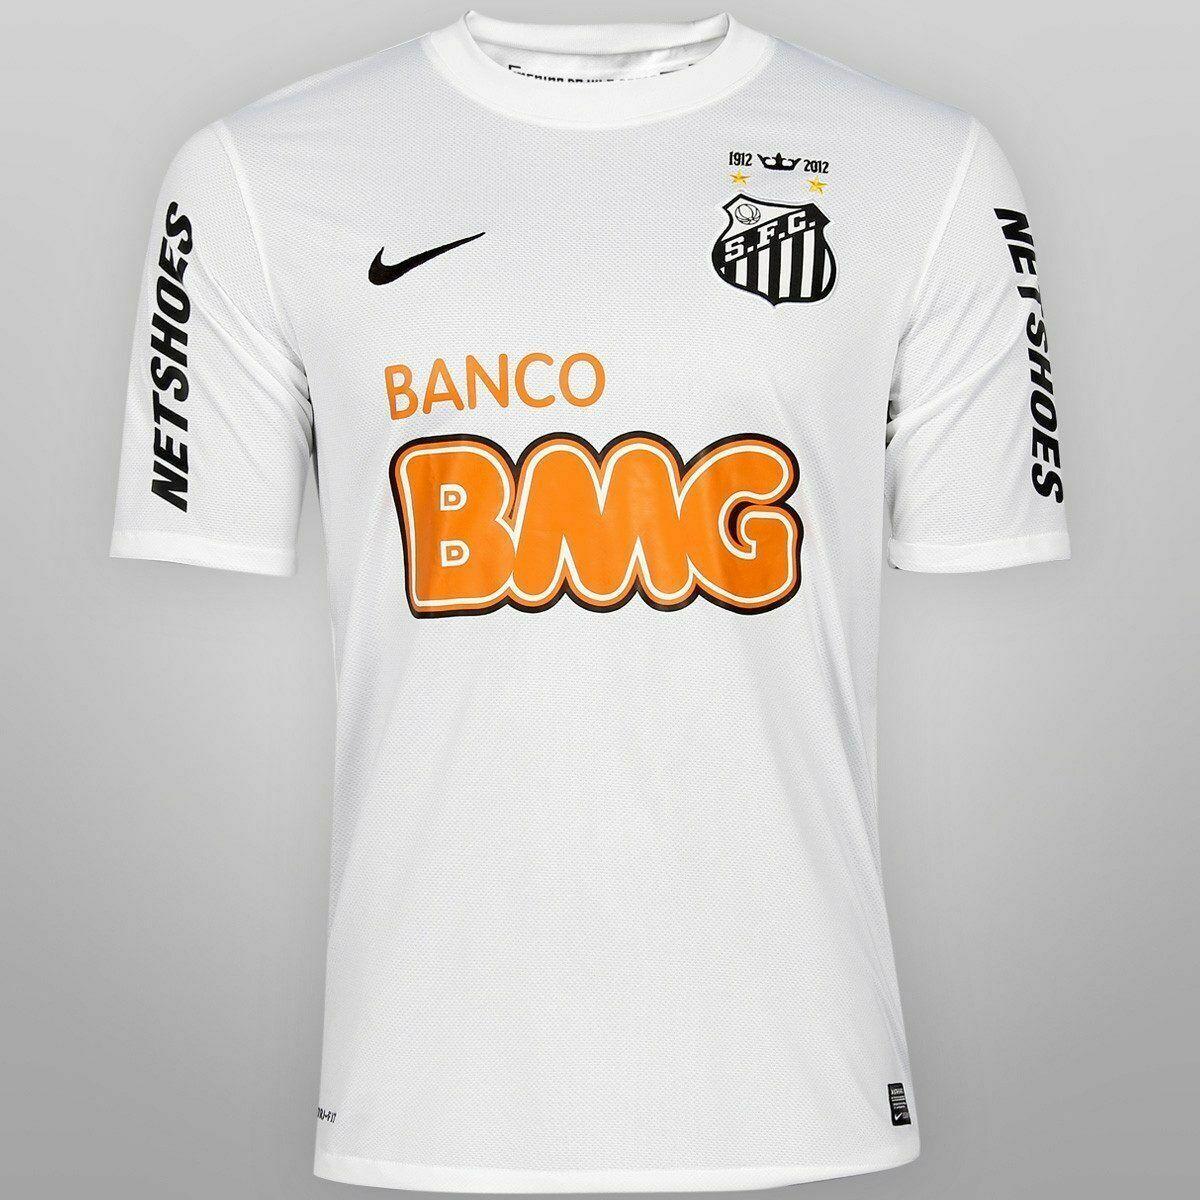 Camiseta Santos 2012 13 nuevos y en Caja Fútbol Brasil Neymar Jersey Local Talla 2XL XXL